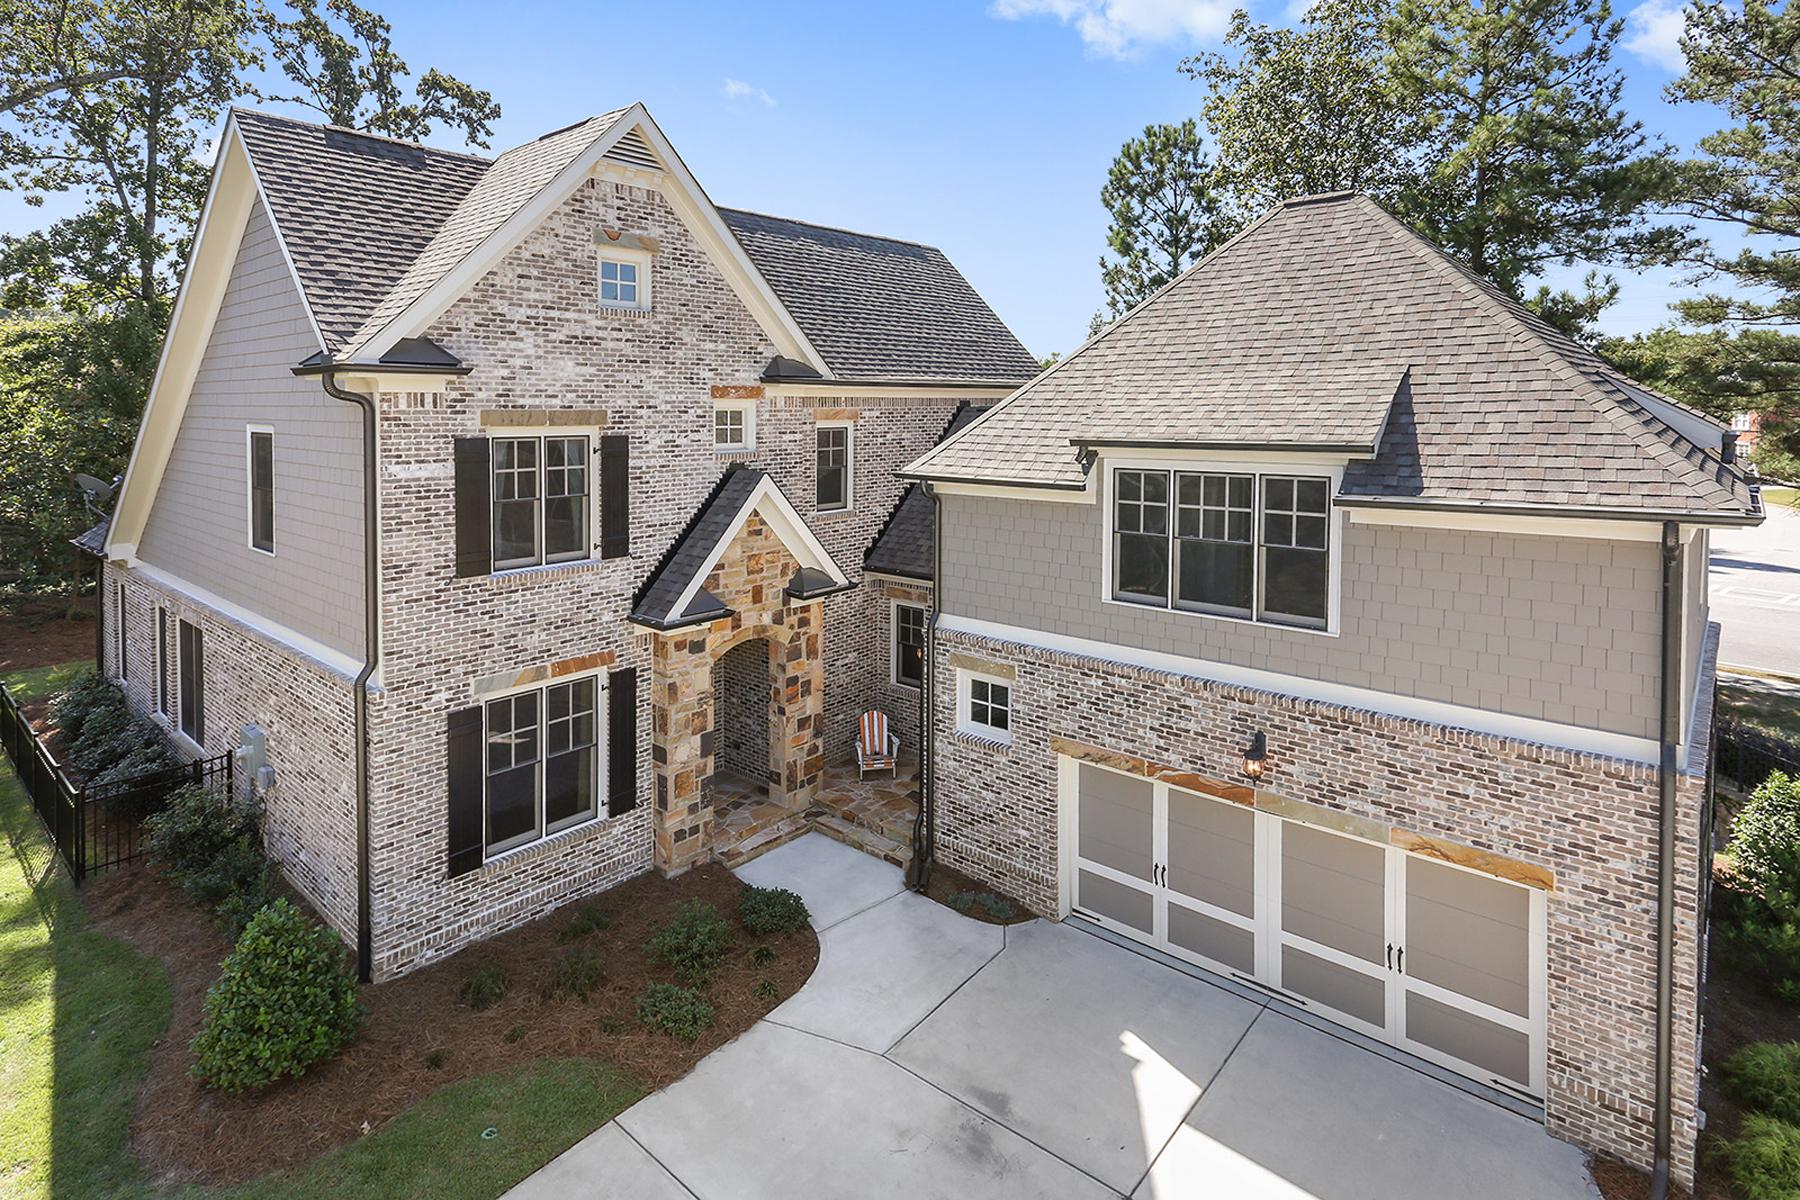 Casa para uma família para Venda às Wonderful Opportunity In Vinings 2700 Vinings Orchard Circle SE Atlanta, Geórgia, 30339 Estados Unidos